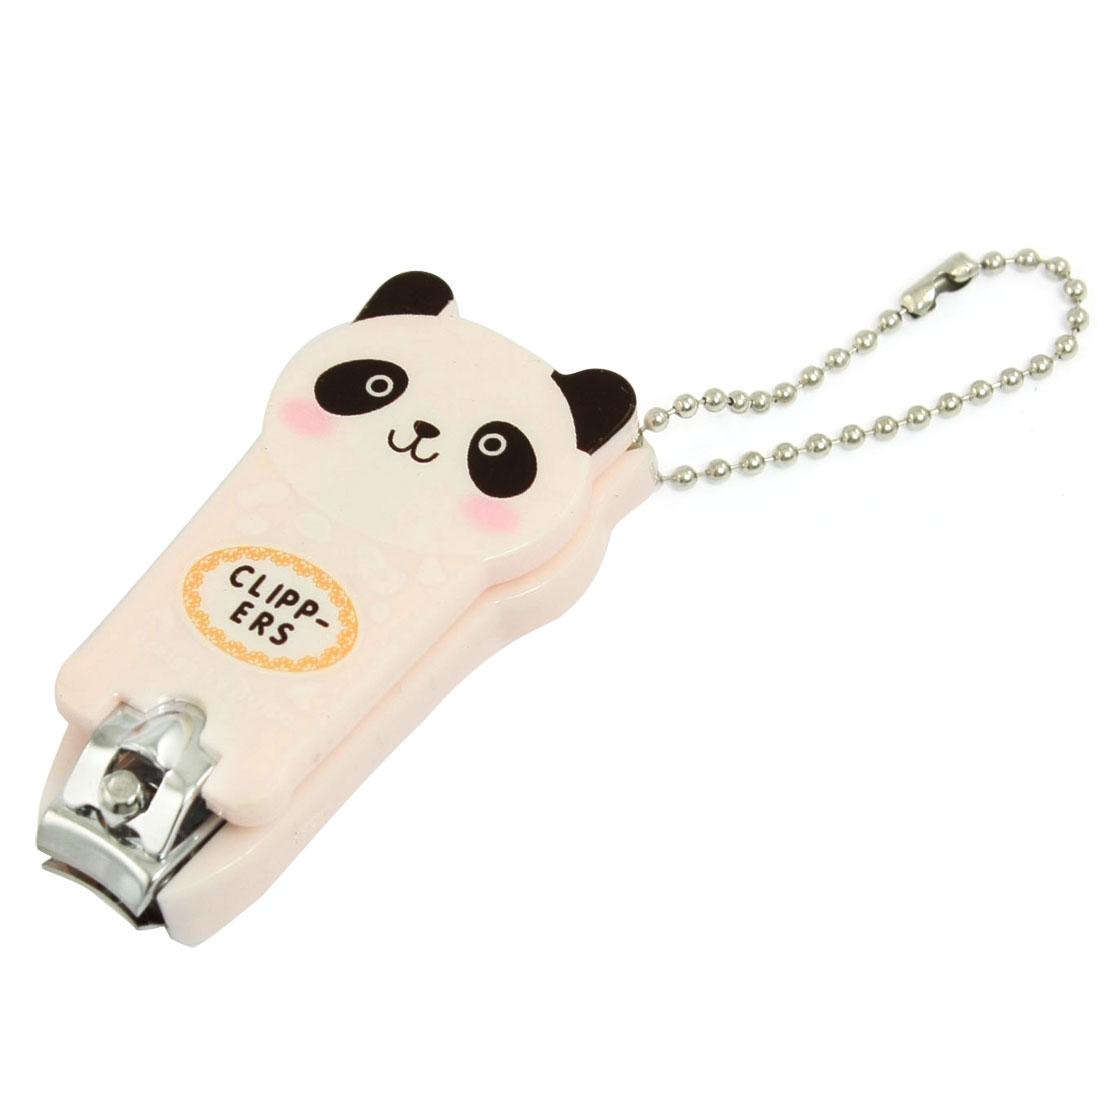 Pink Plastic Cartoon Panda Toe Cutter Nail Clipper Tool w Key Ring